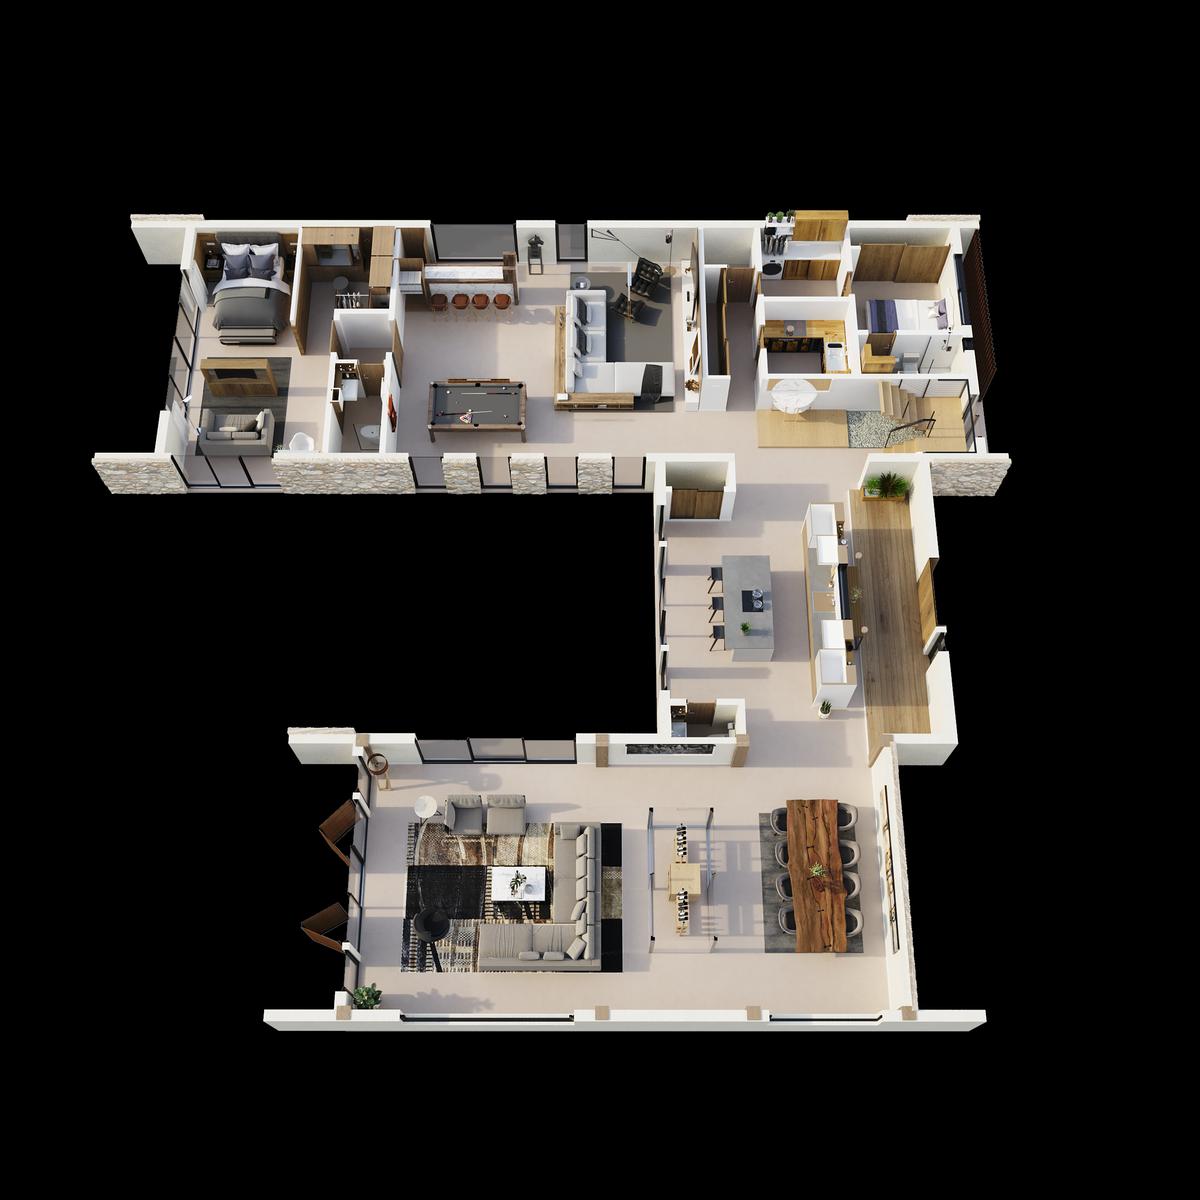 13 de 14: Primer piso